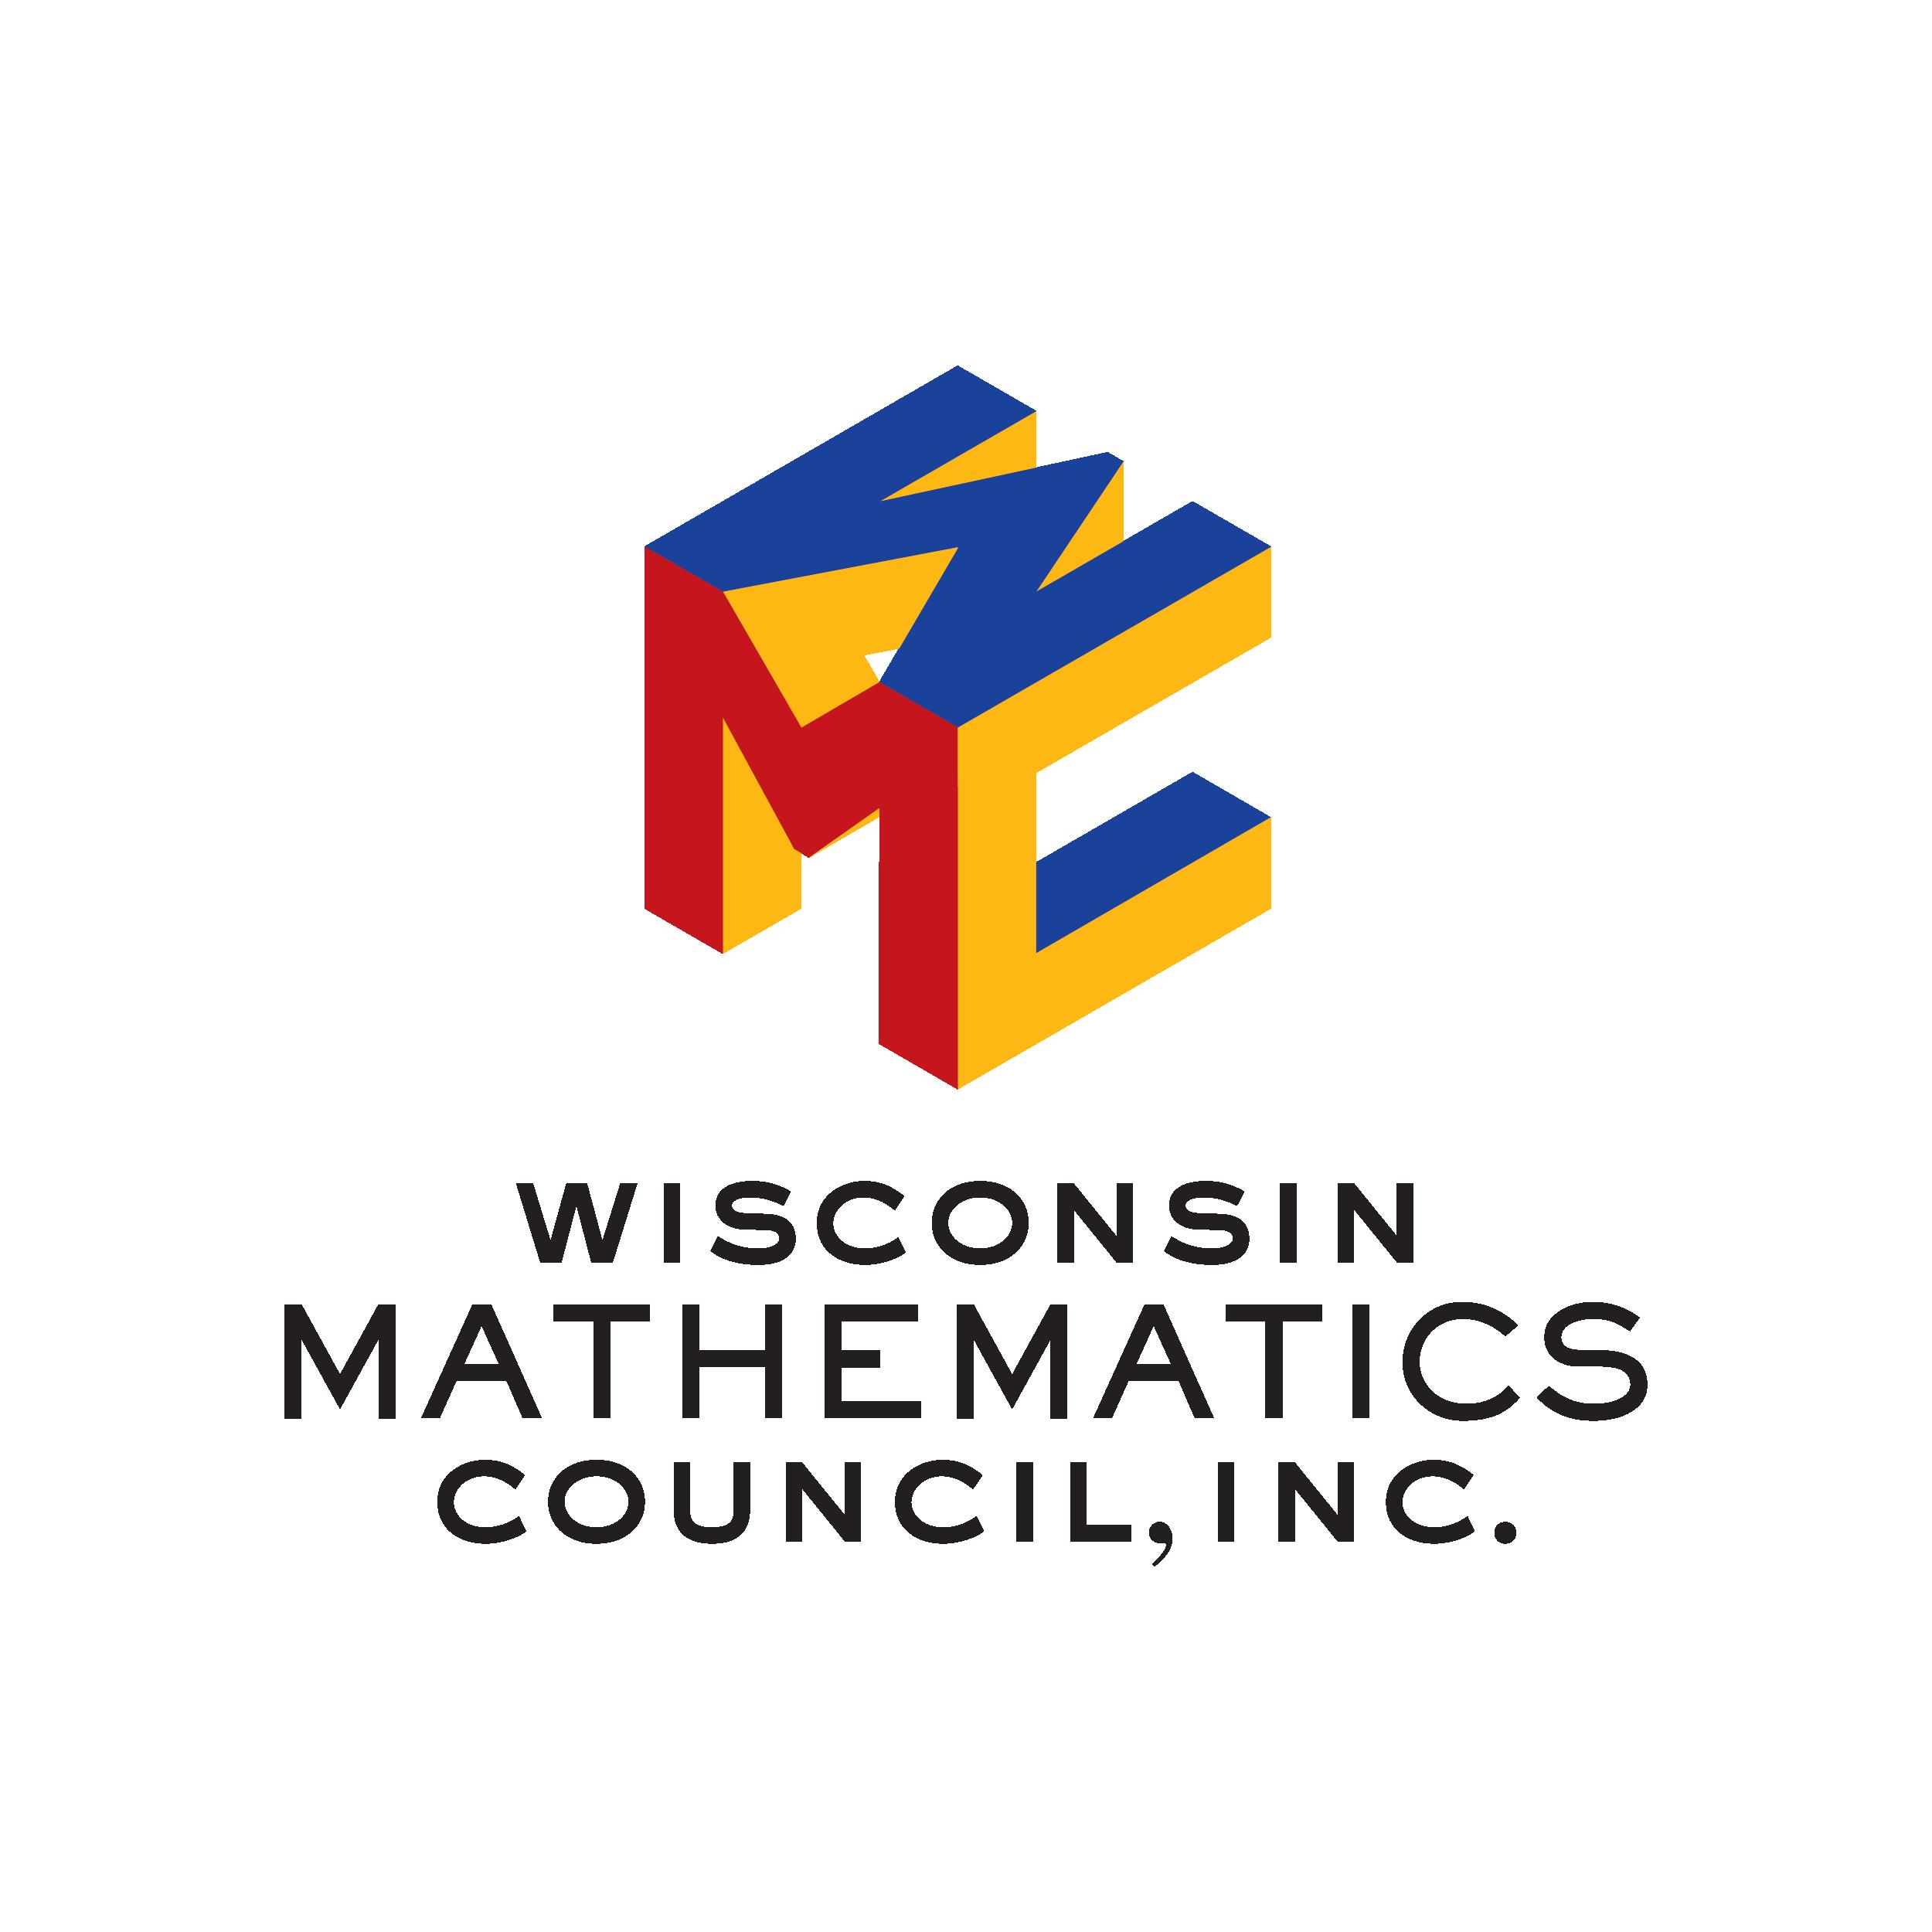 Wisconsin Mathematics Council